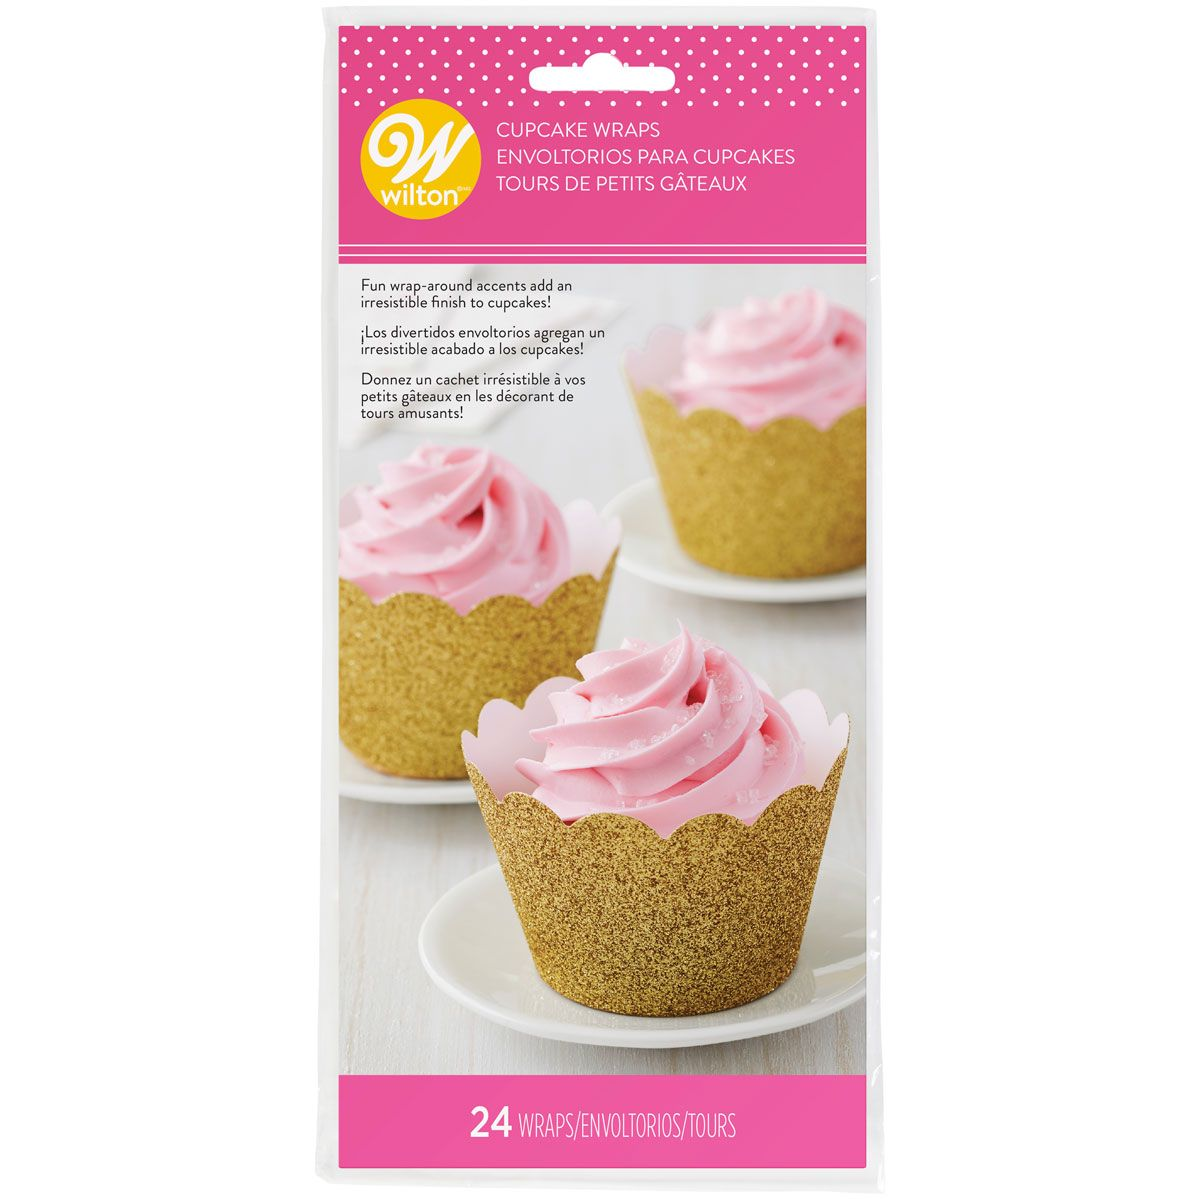 Wilton Cupcake Wrappers glitzernd gold - Deko Muffinförmchen Kuchen, 24 Stück